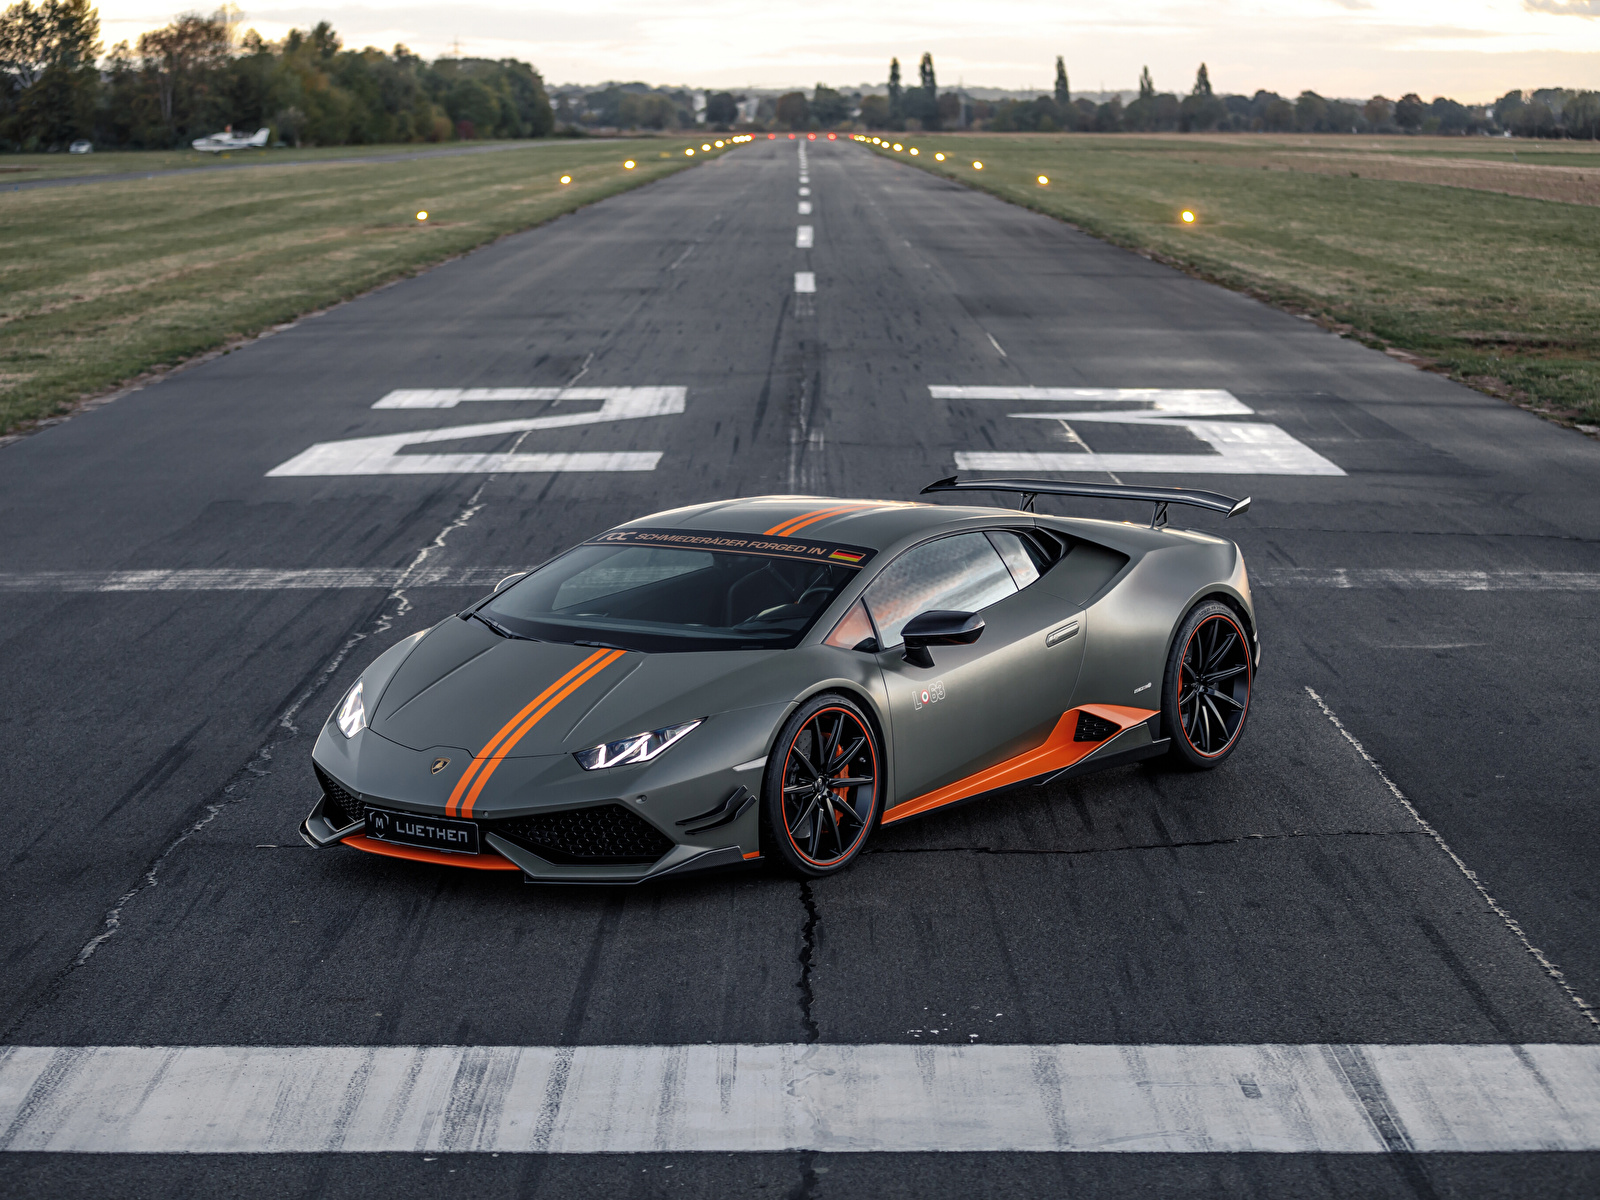 Foto Lamborghini 2018-19 Luethen Motorsport Huracan LP 610-4 Avio graue Autos 1600x1200 Grau graues